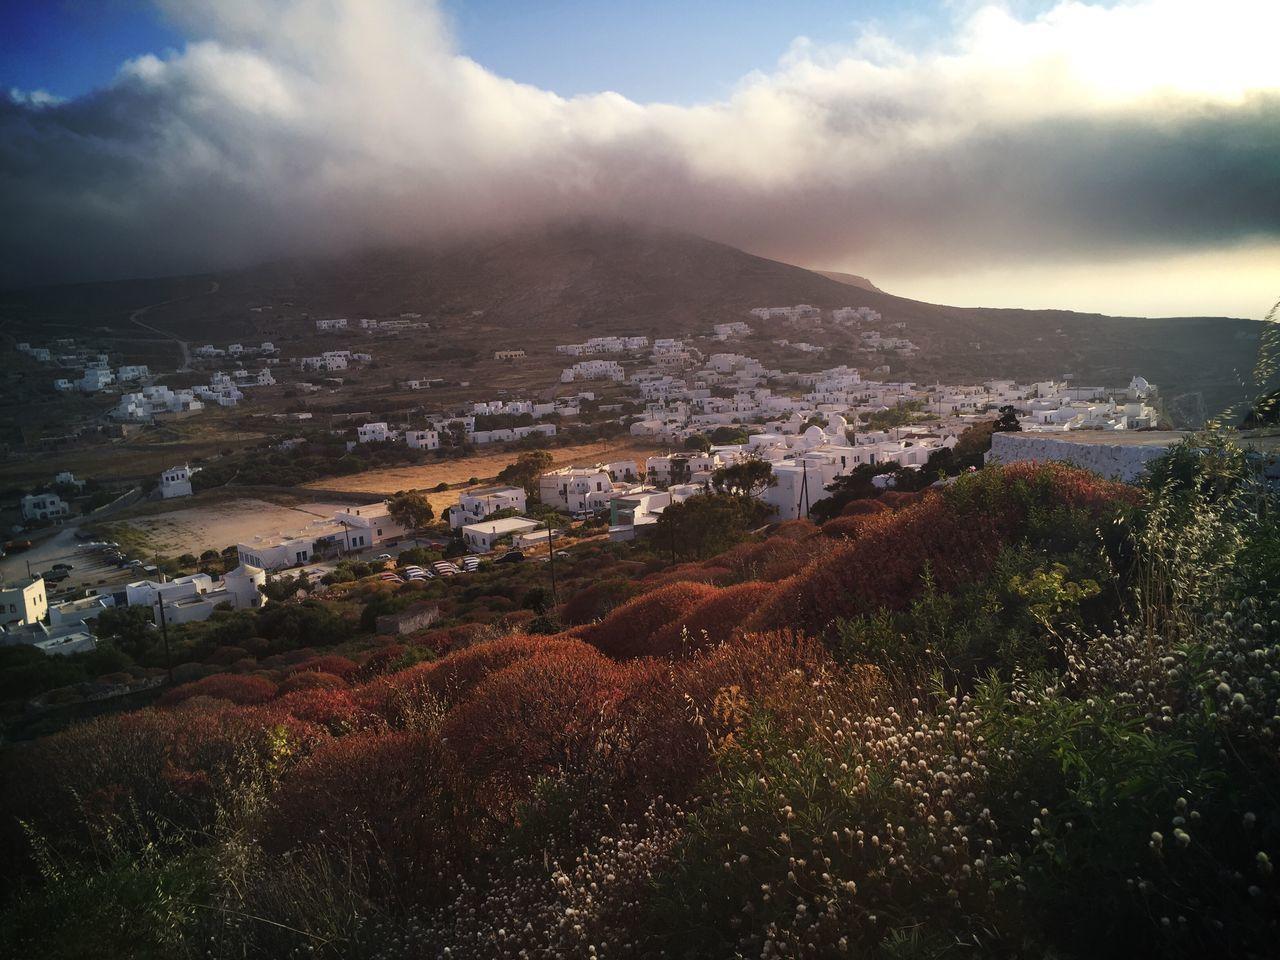 Greece Cyclades Folegandros Wanderlust Hiking Colourful Greece